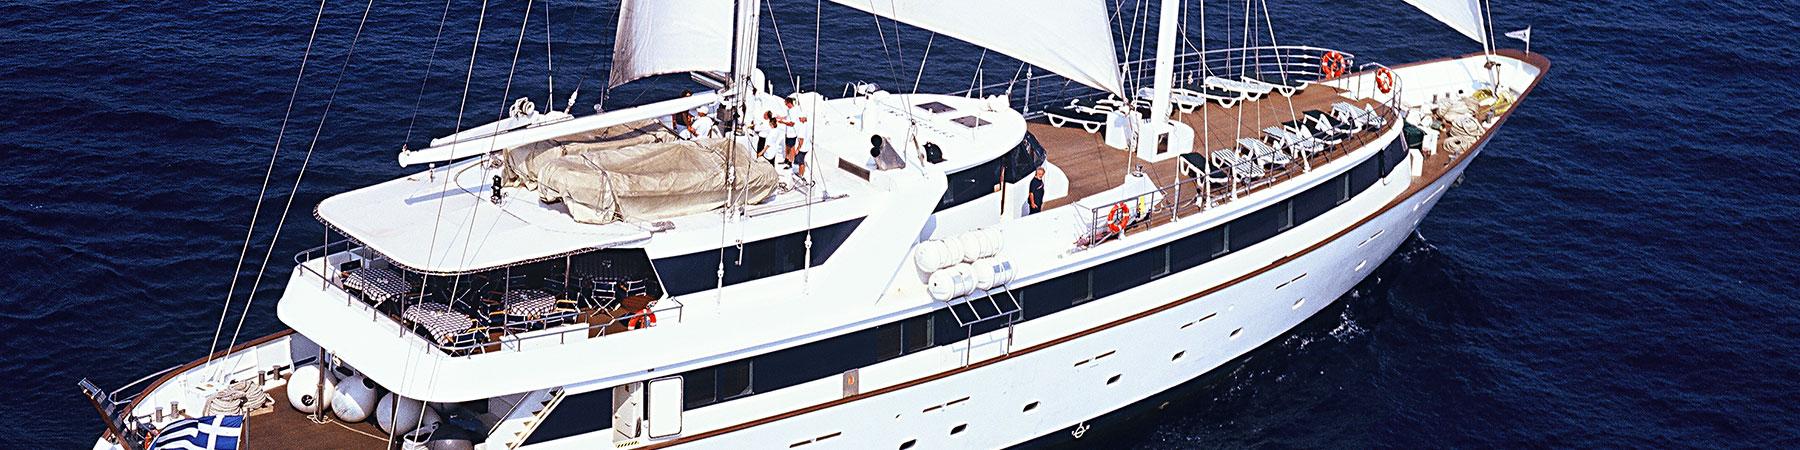 Masthead-Our-Ship-panorama-ii